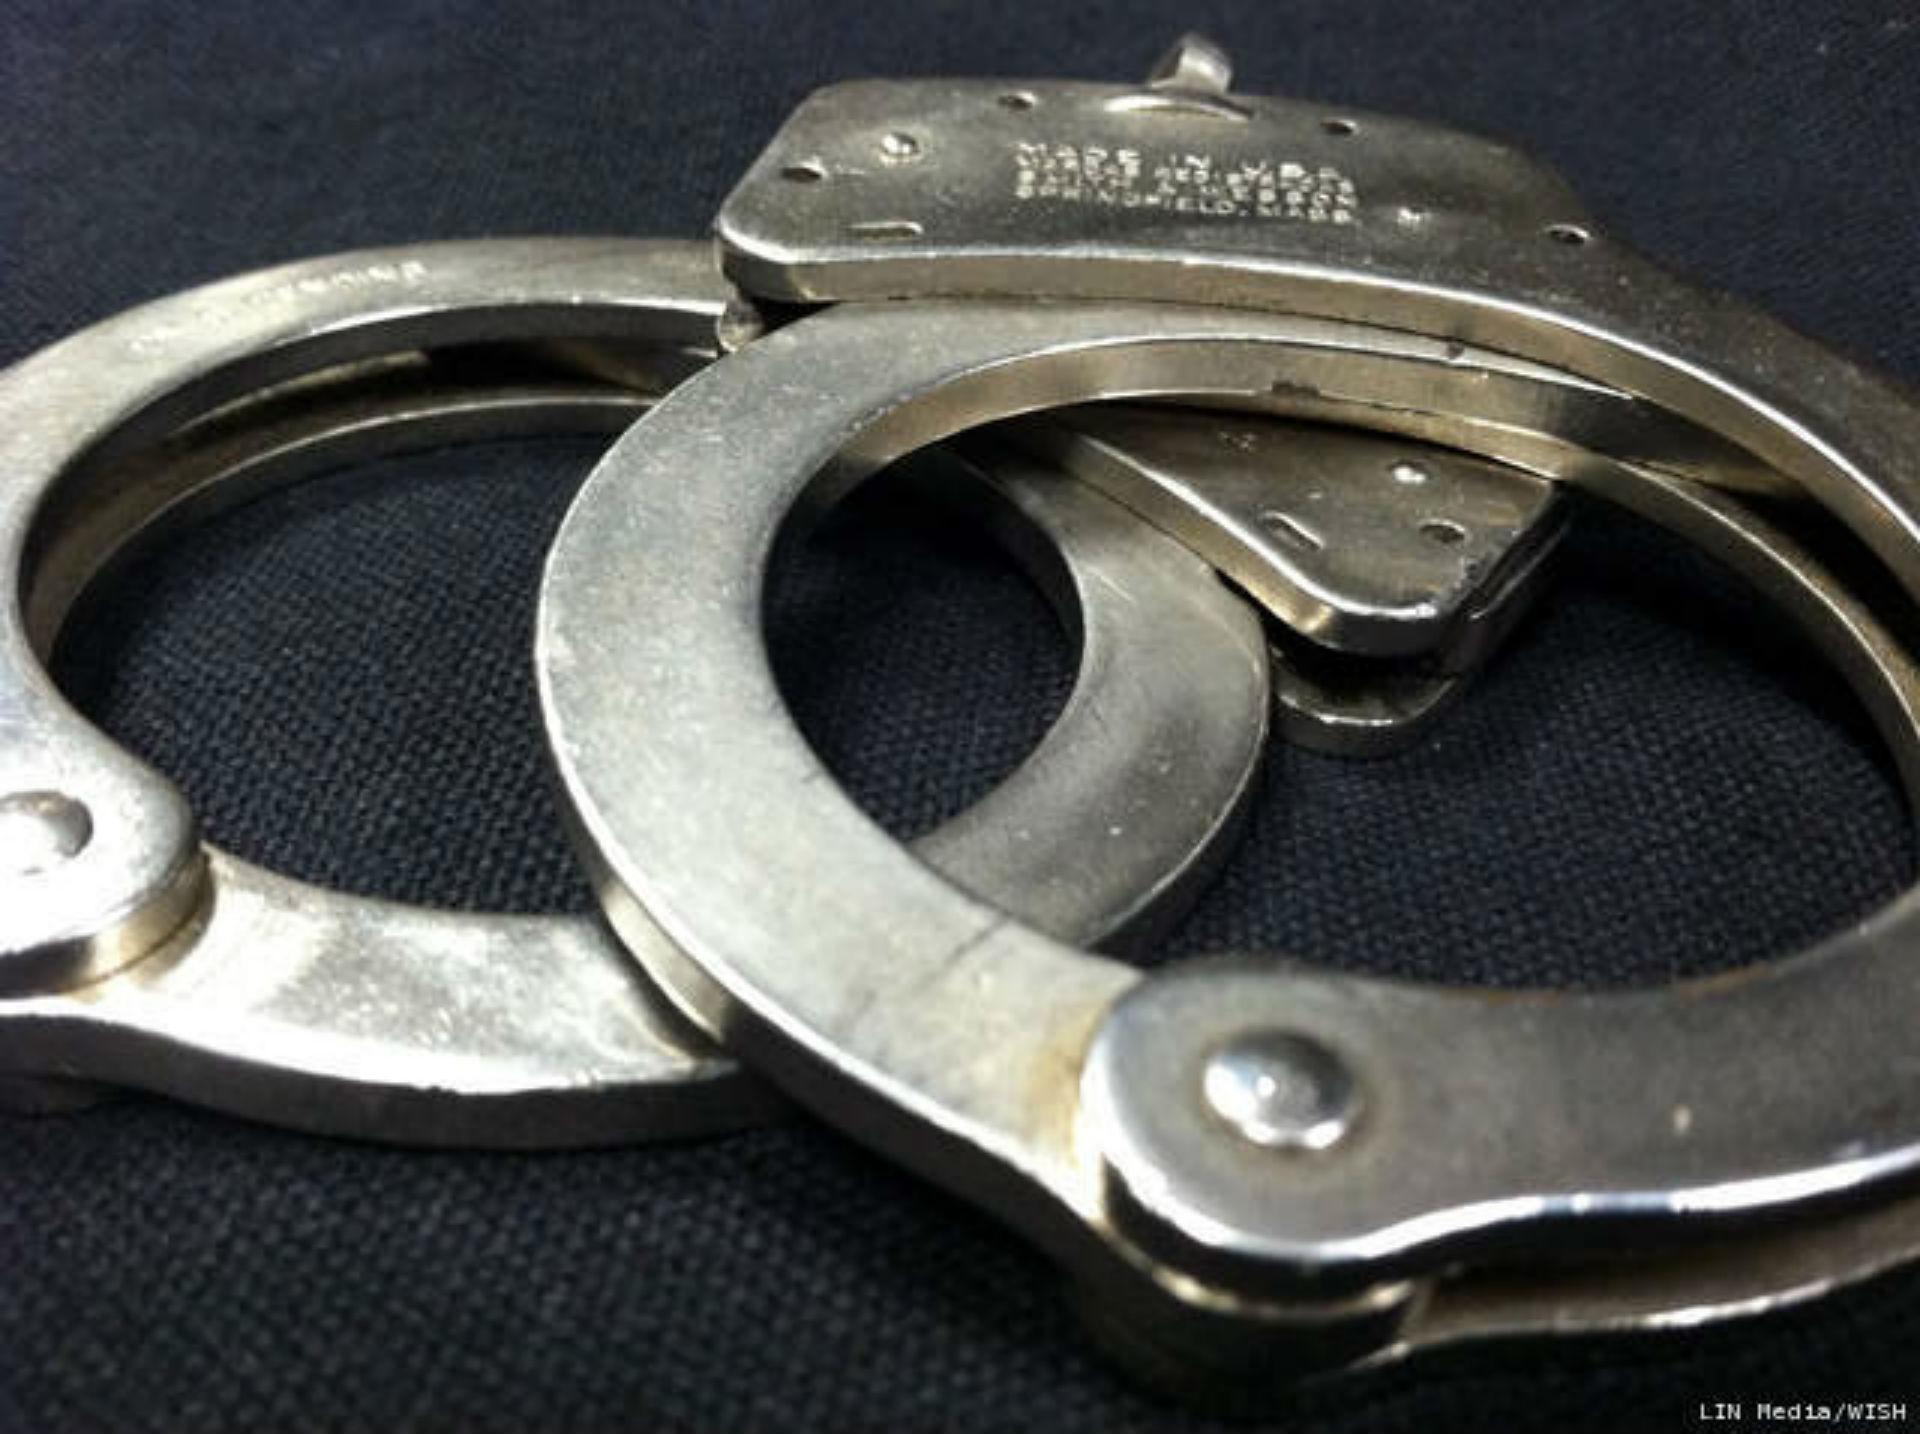 handcuffs_1522336799023.jpg